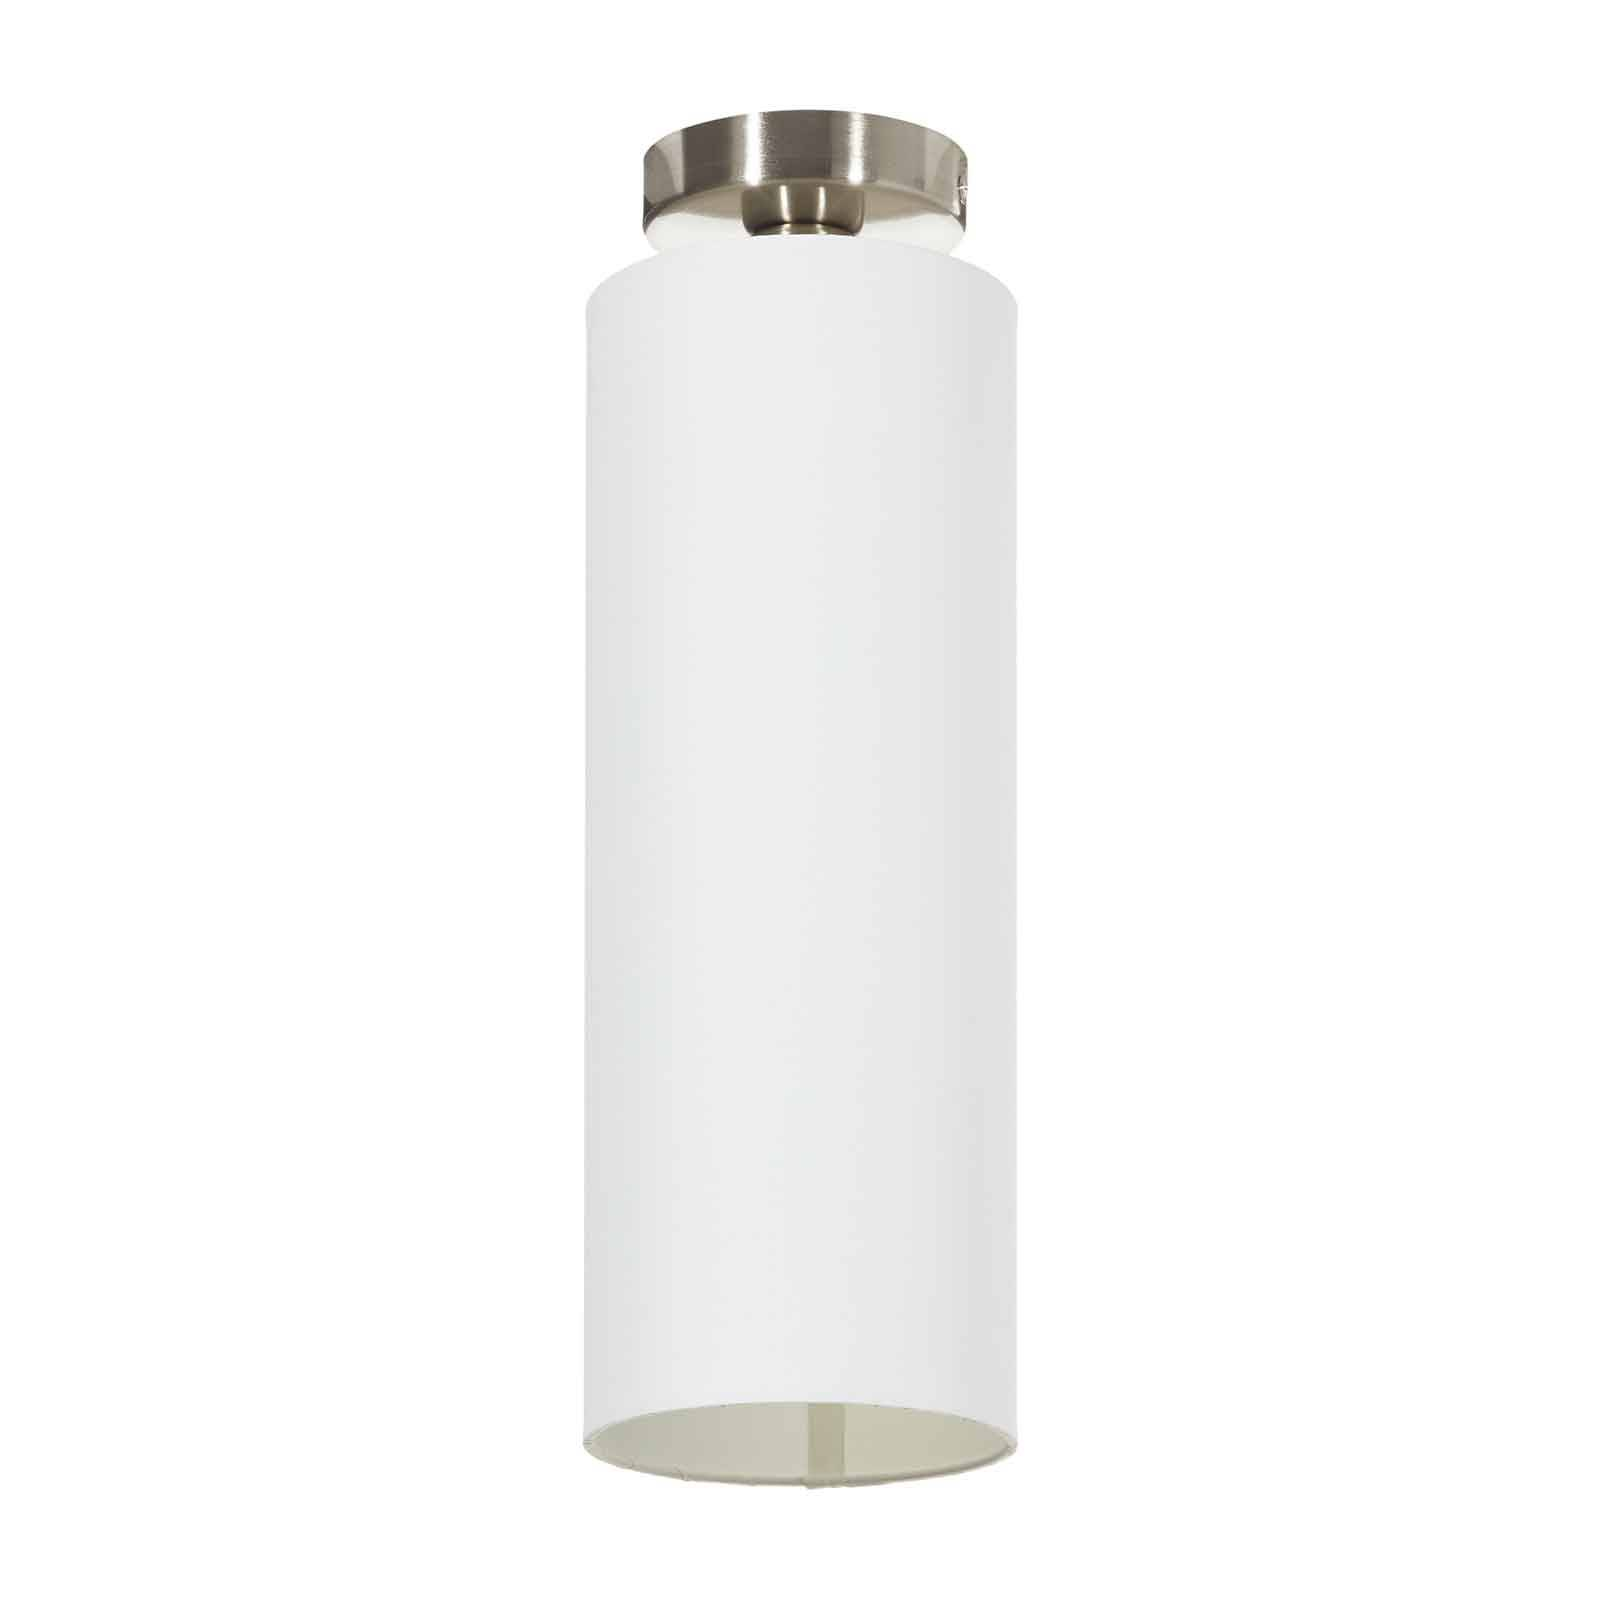 Lucande Patrik tekstylna lampa sufitowa 15cm biała